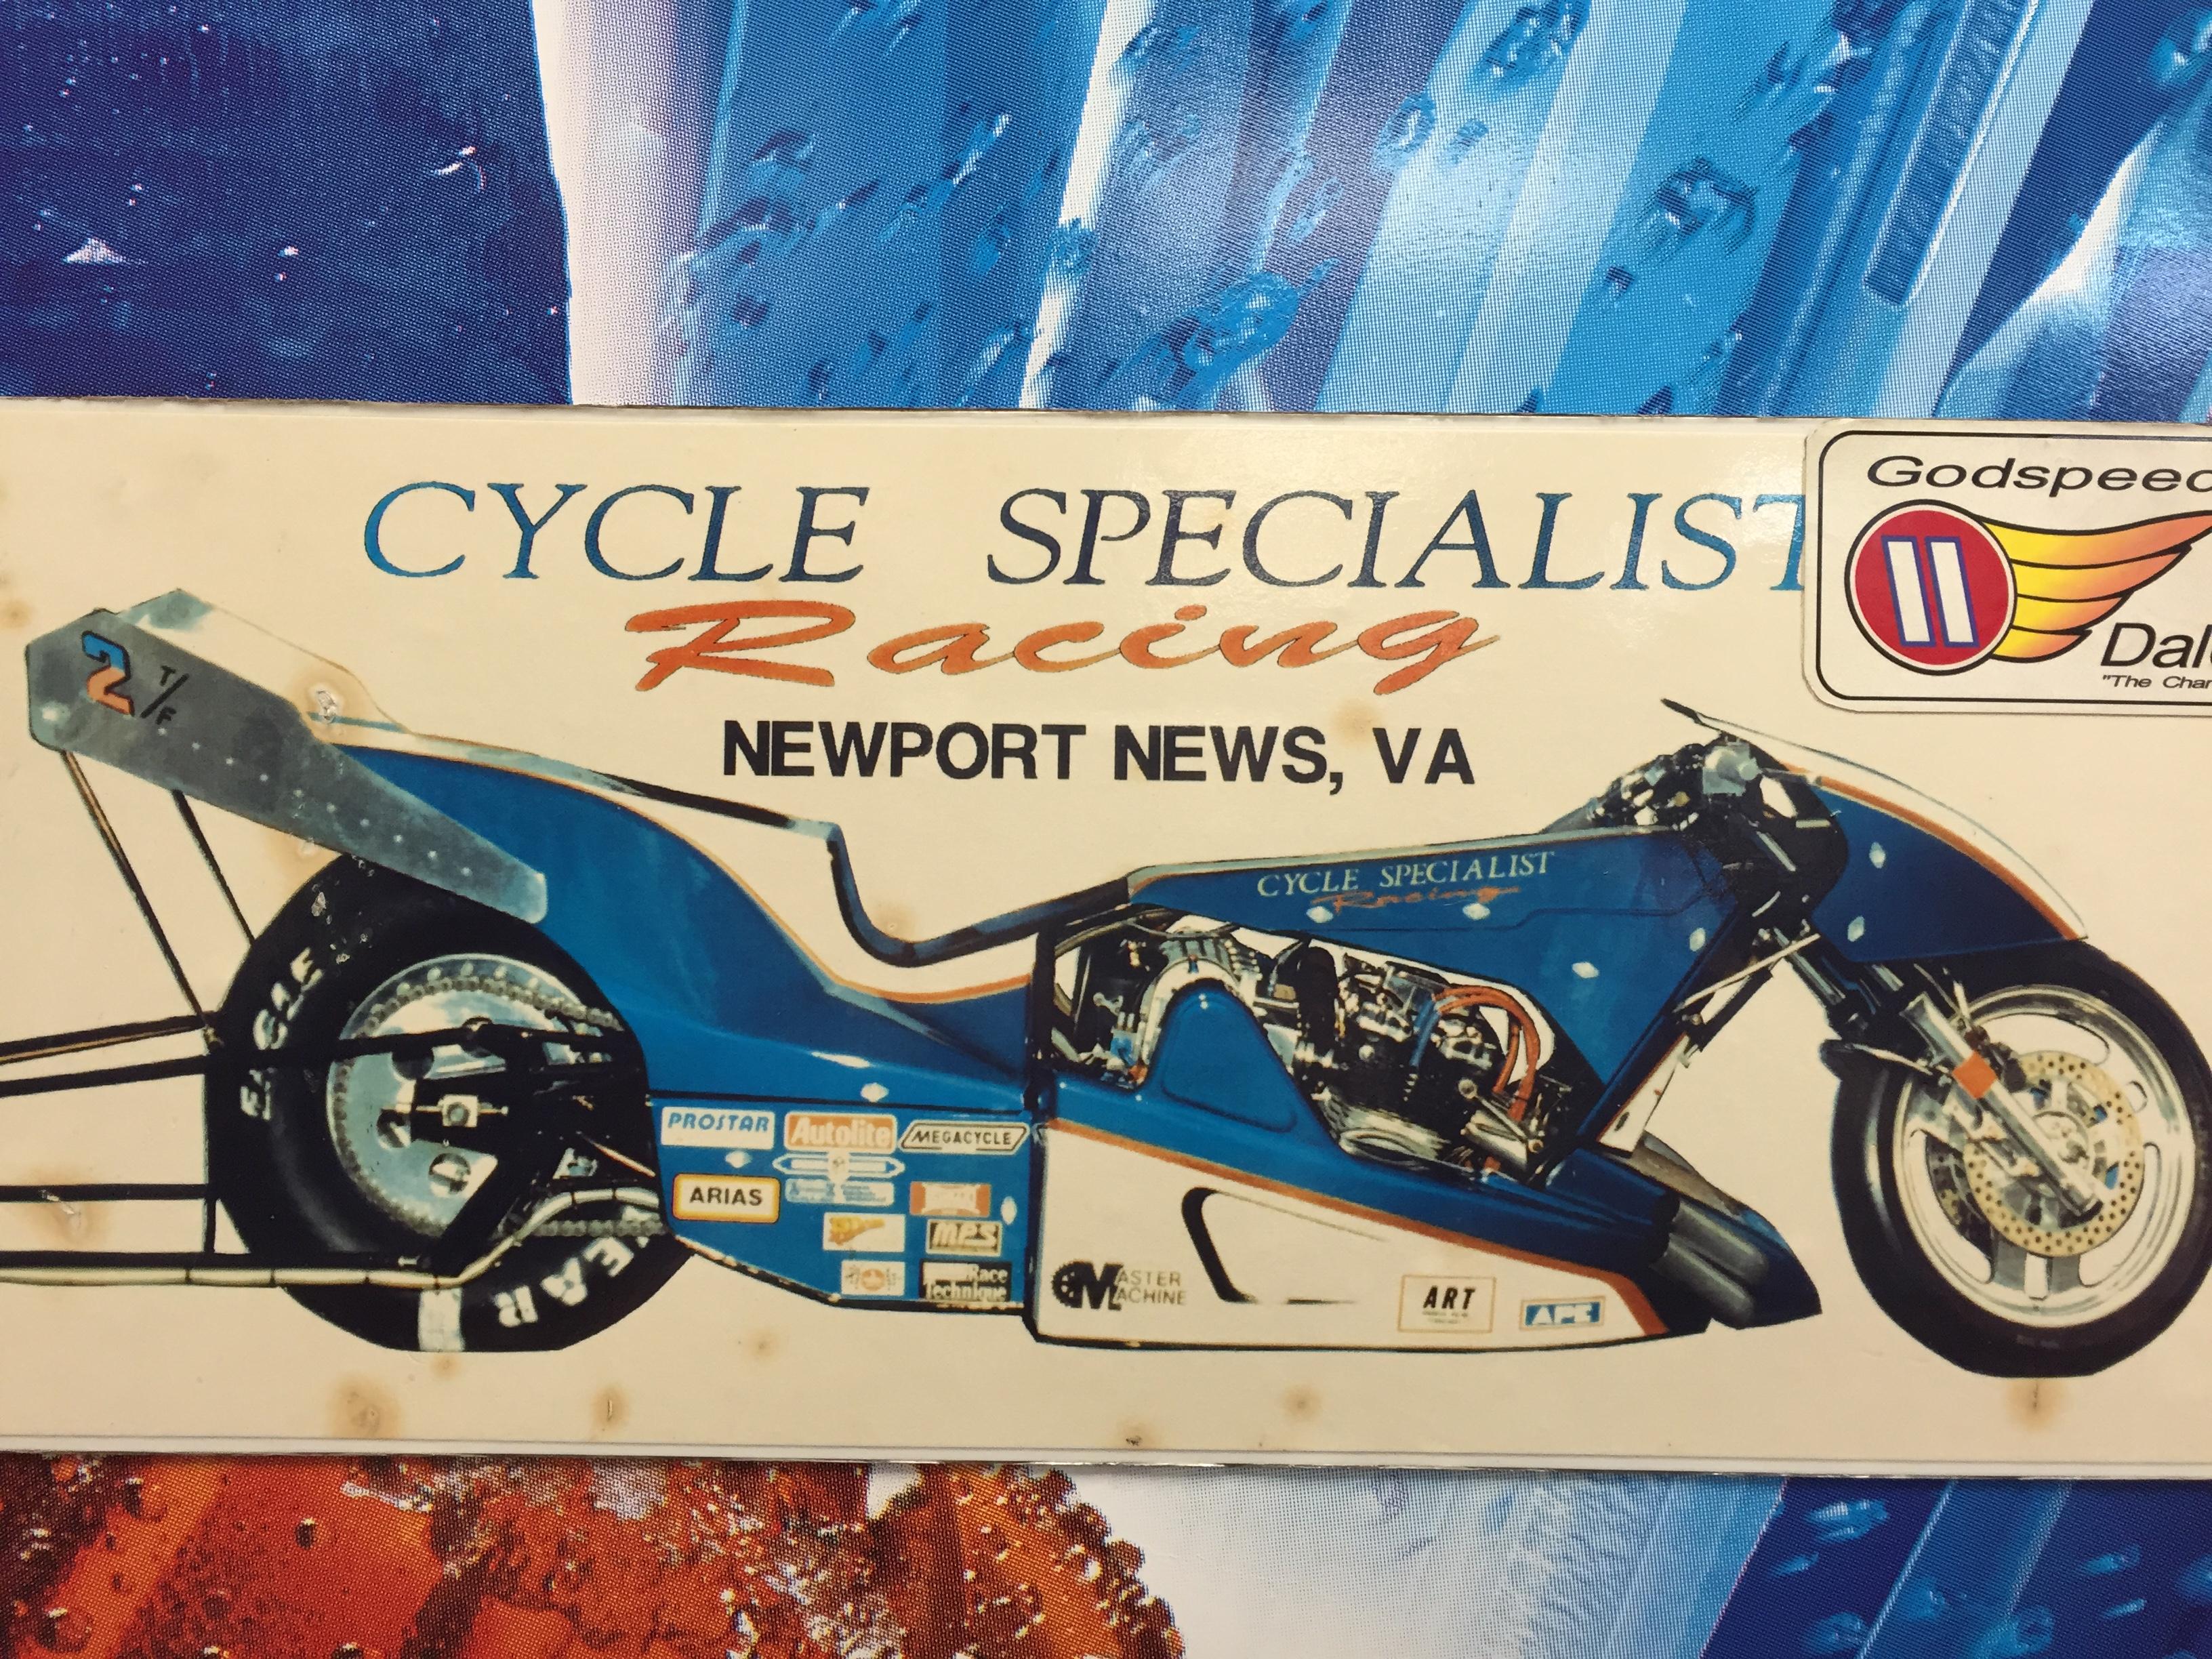 Larry McBride Cycle Specialist